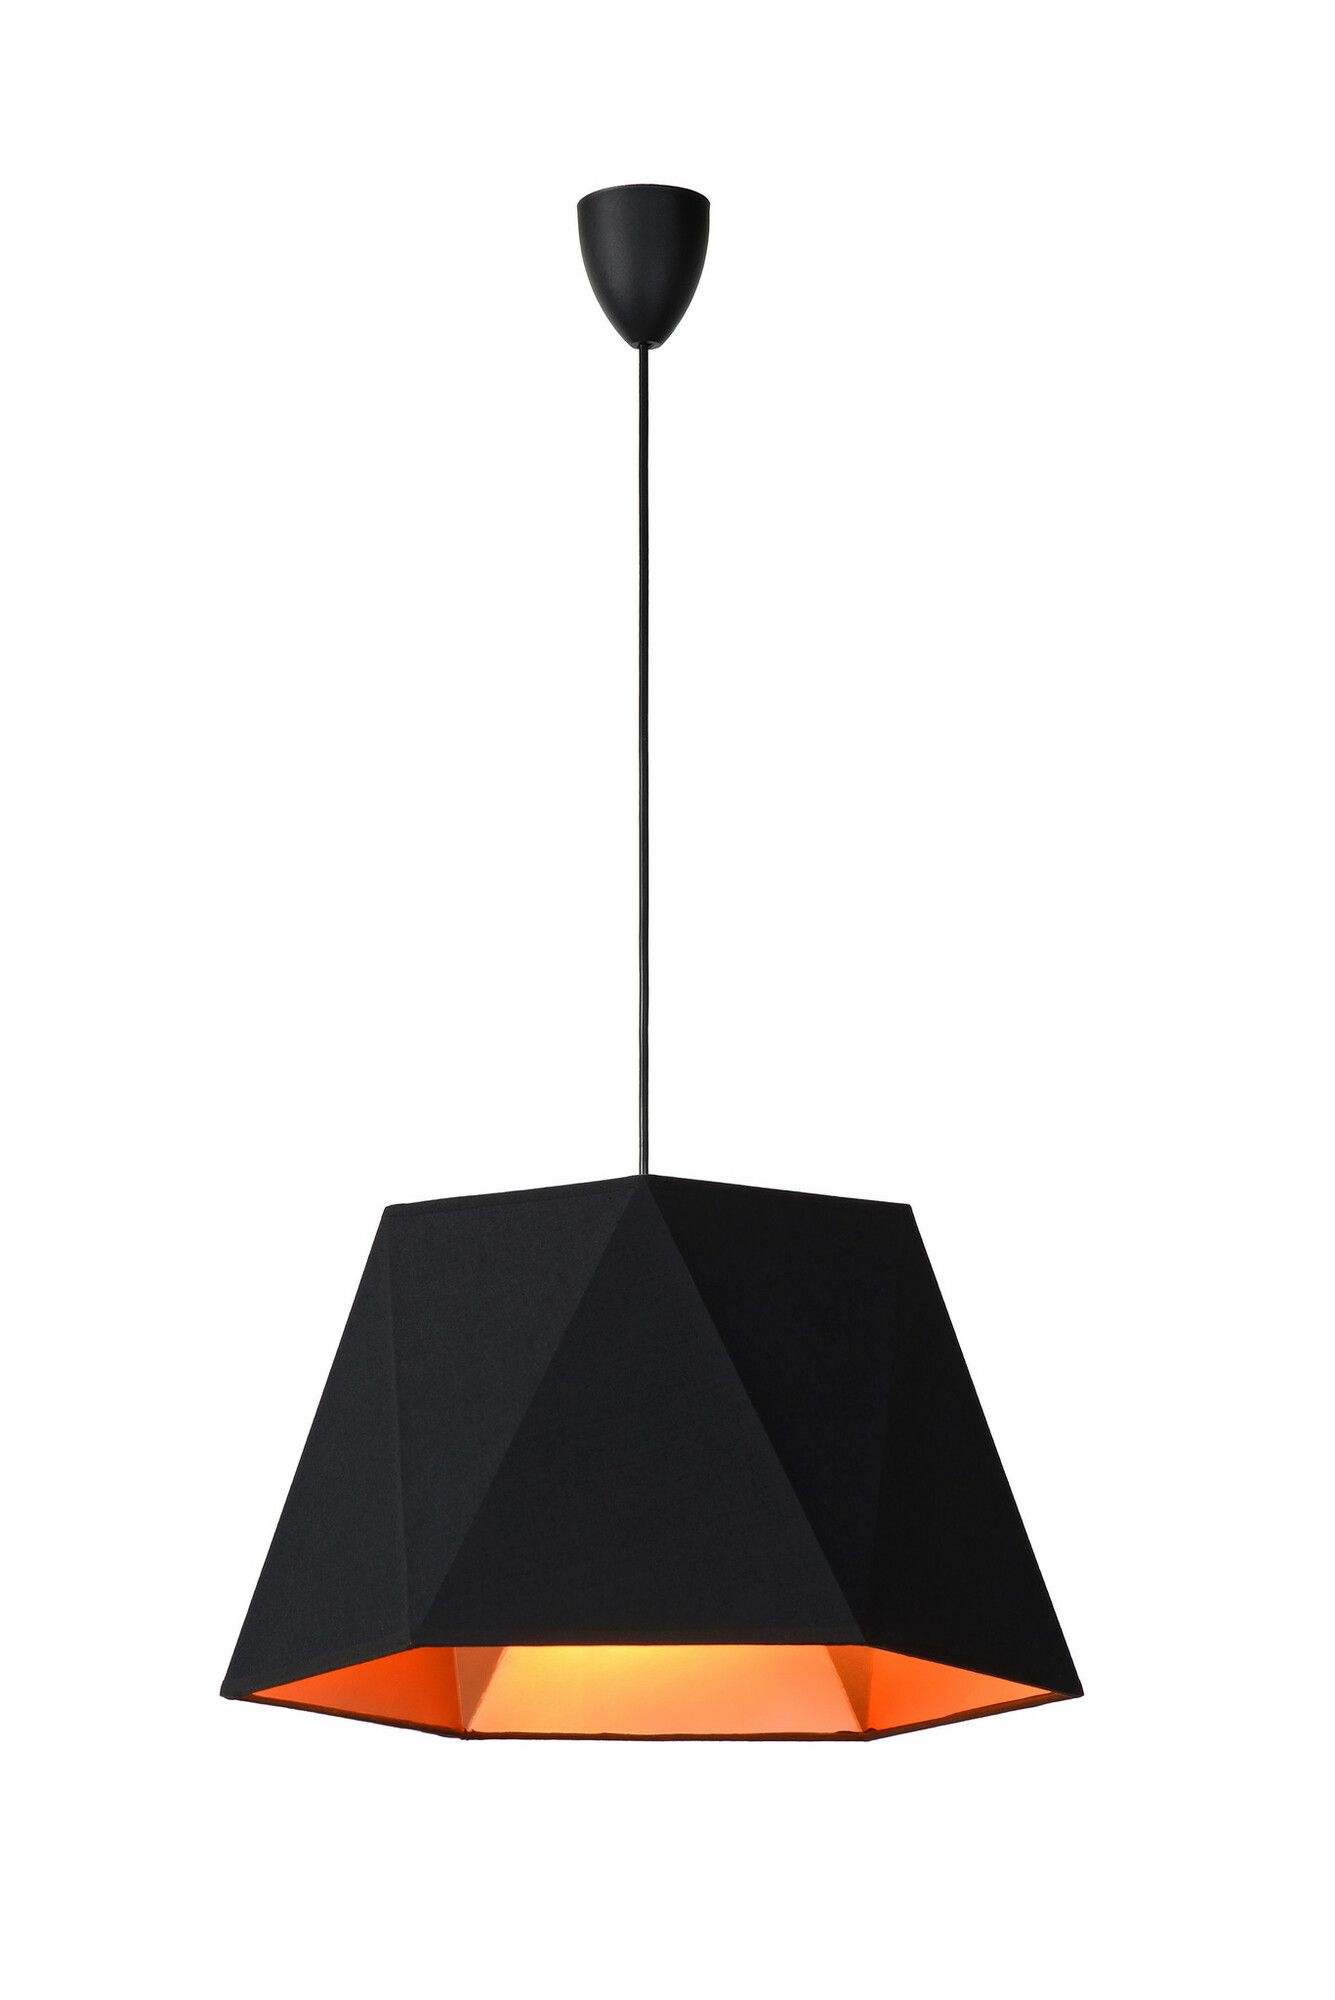 rail-hanglamp